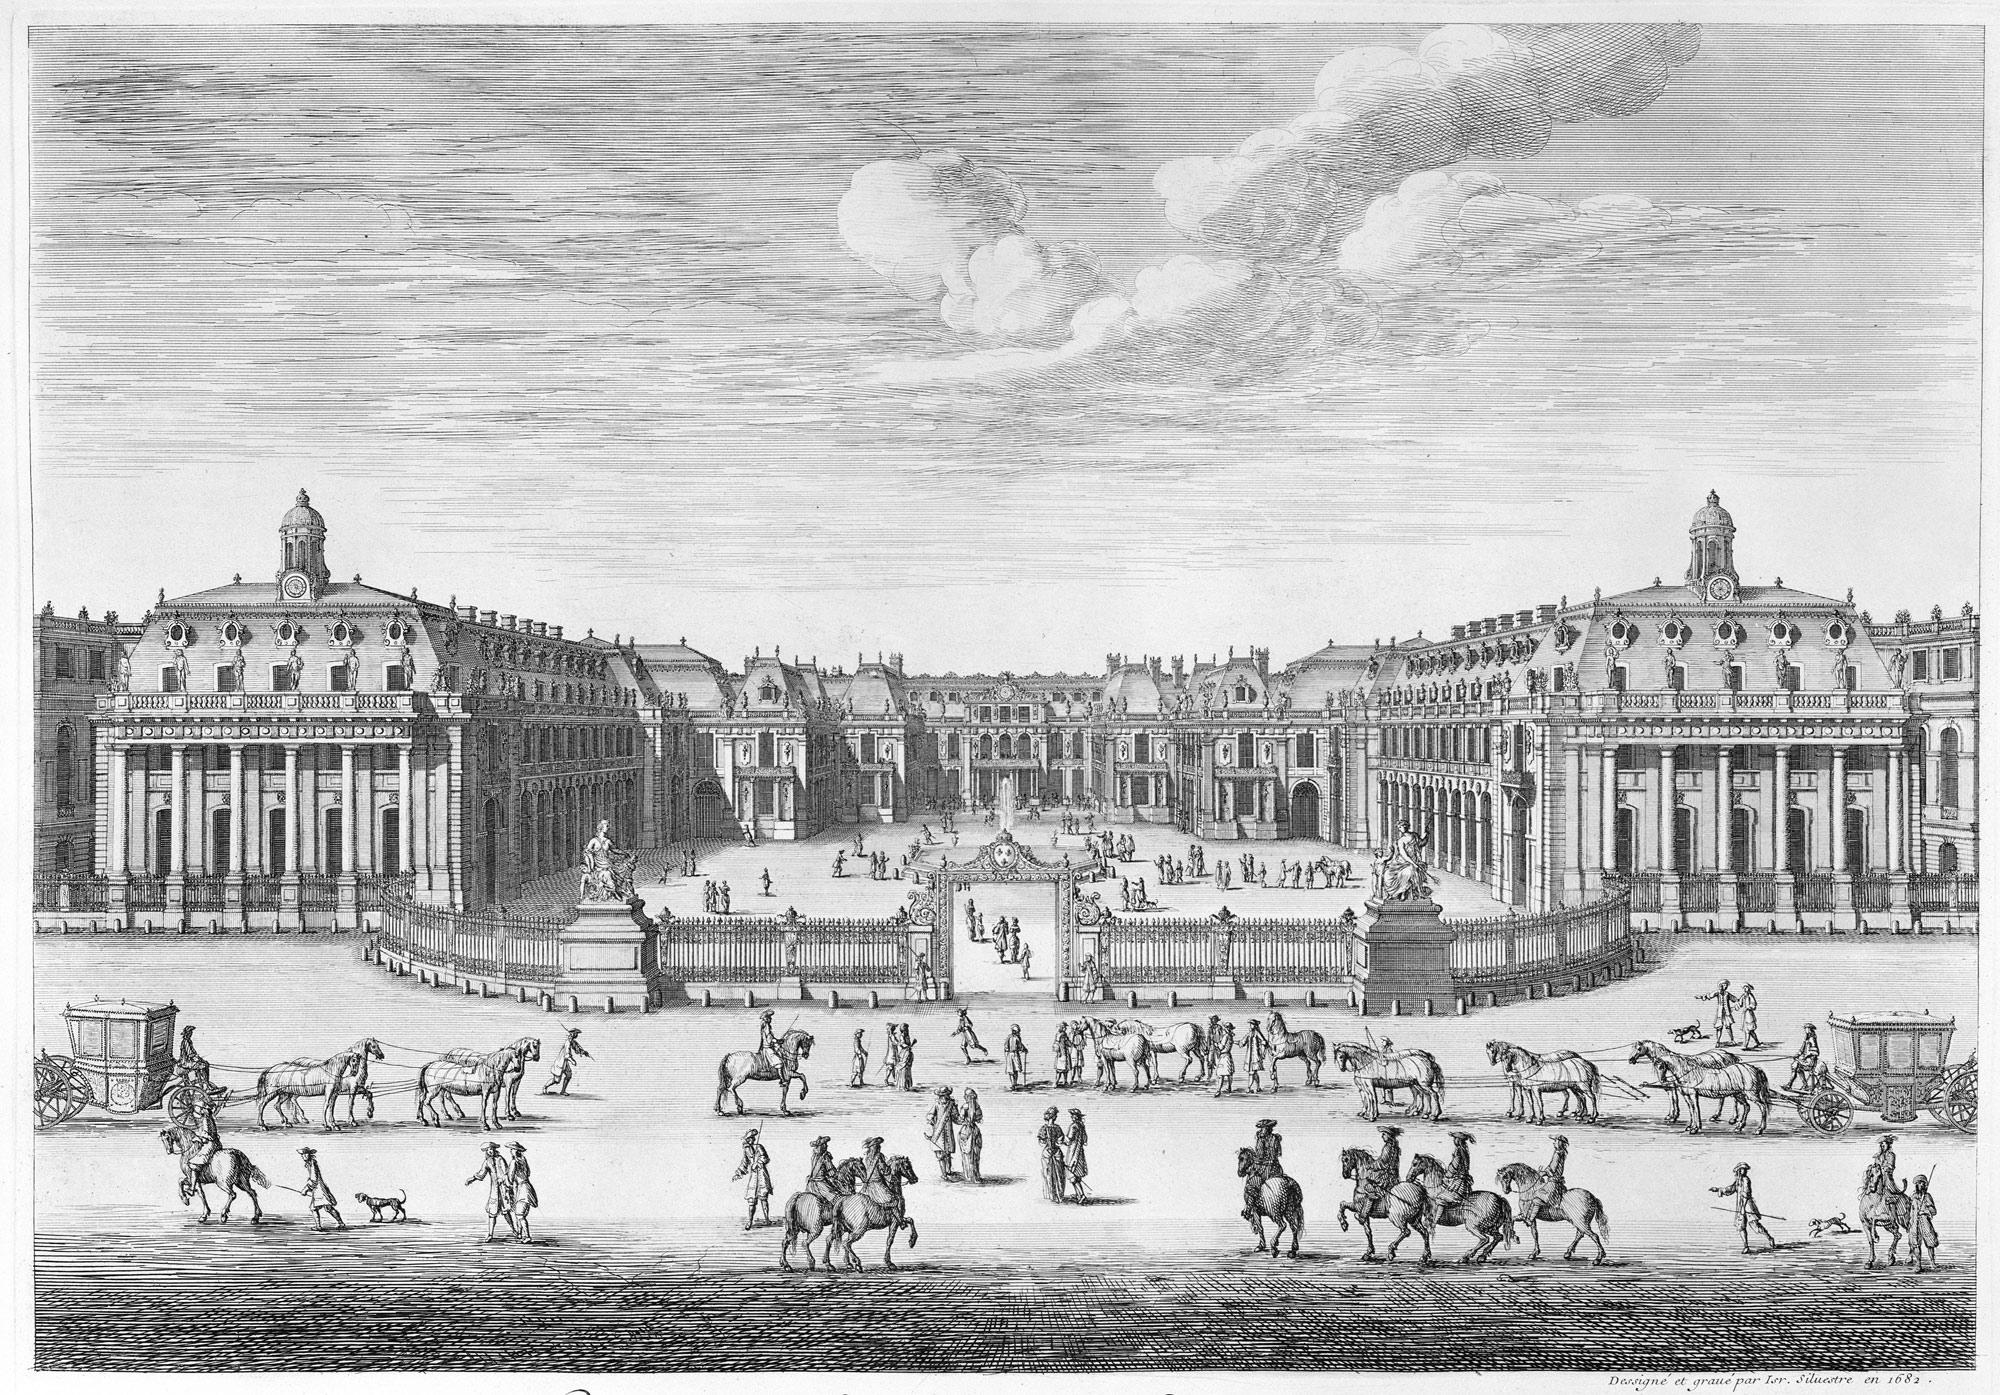 Château de Versailles seen from the forecourt, from Chalcographie du  Louvre, Vol. 22